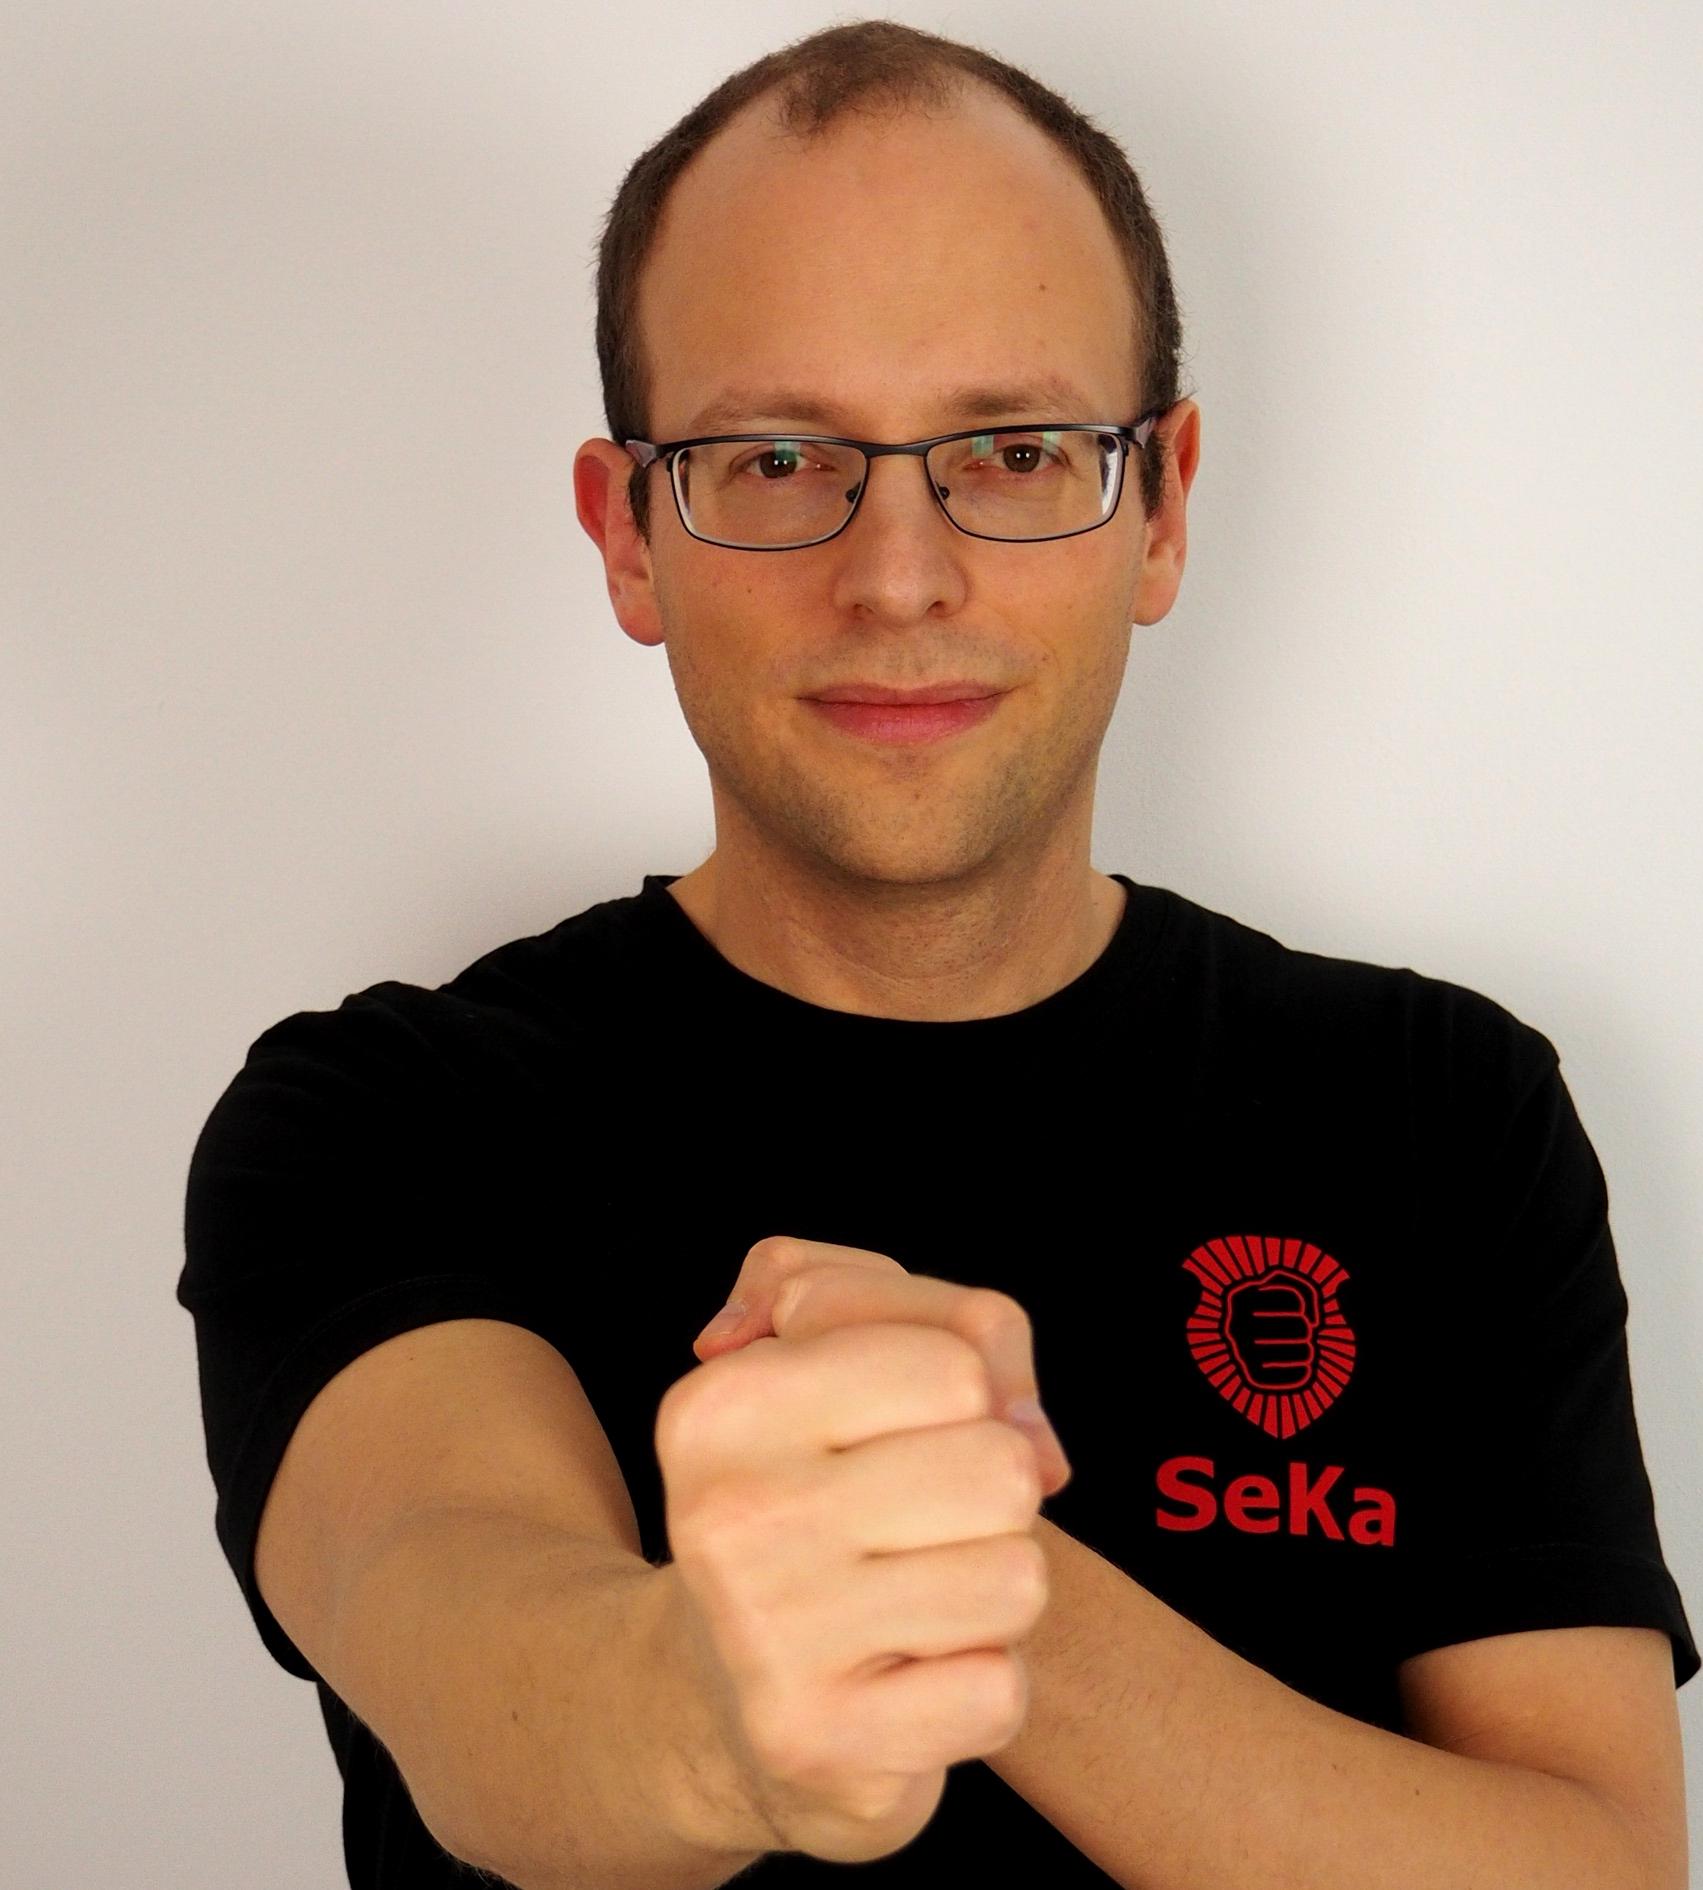 Martin Grünstäudl